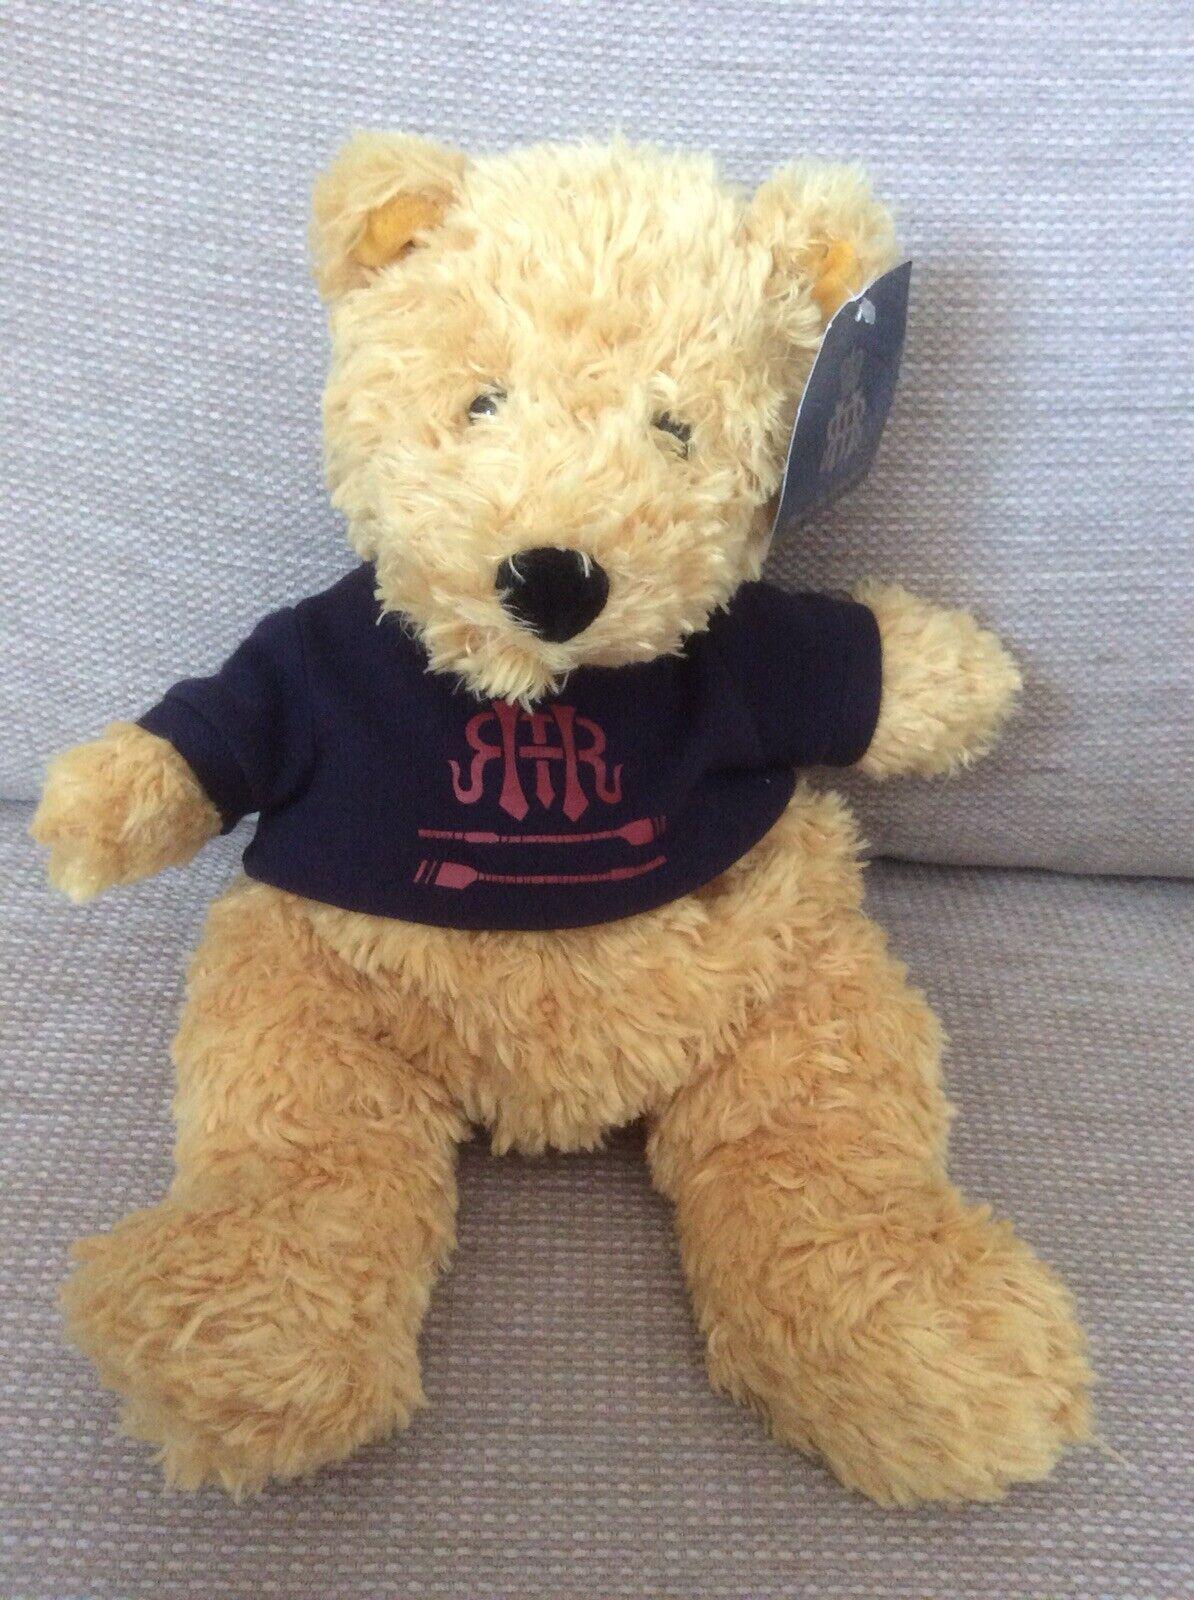 "HENLEY REGATTA TEDDY BEAR WITH TAG RETIRED JELLYCAT TOASTIE BEAR 12"" J392"